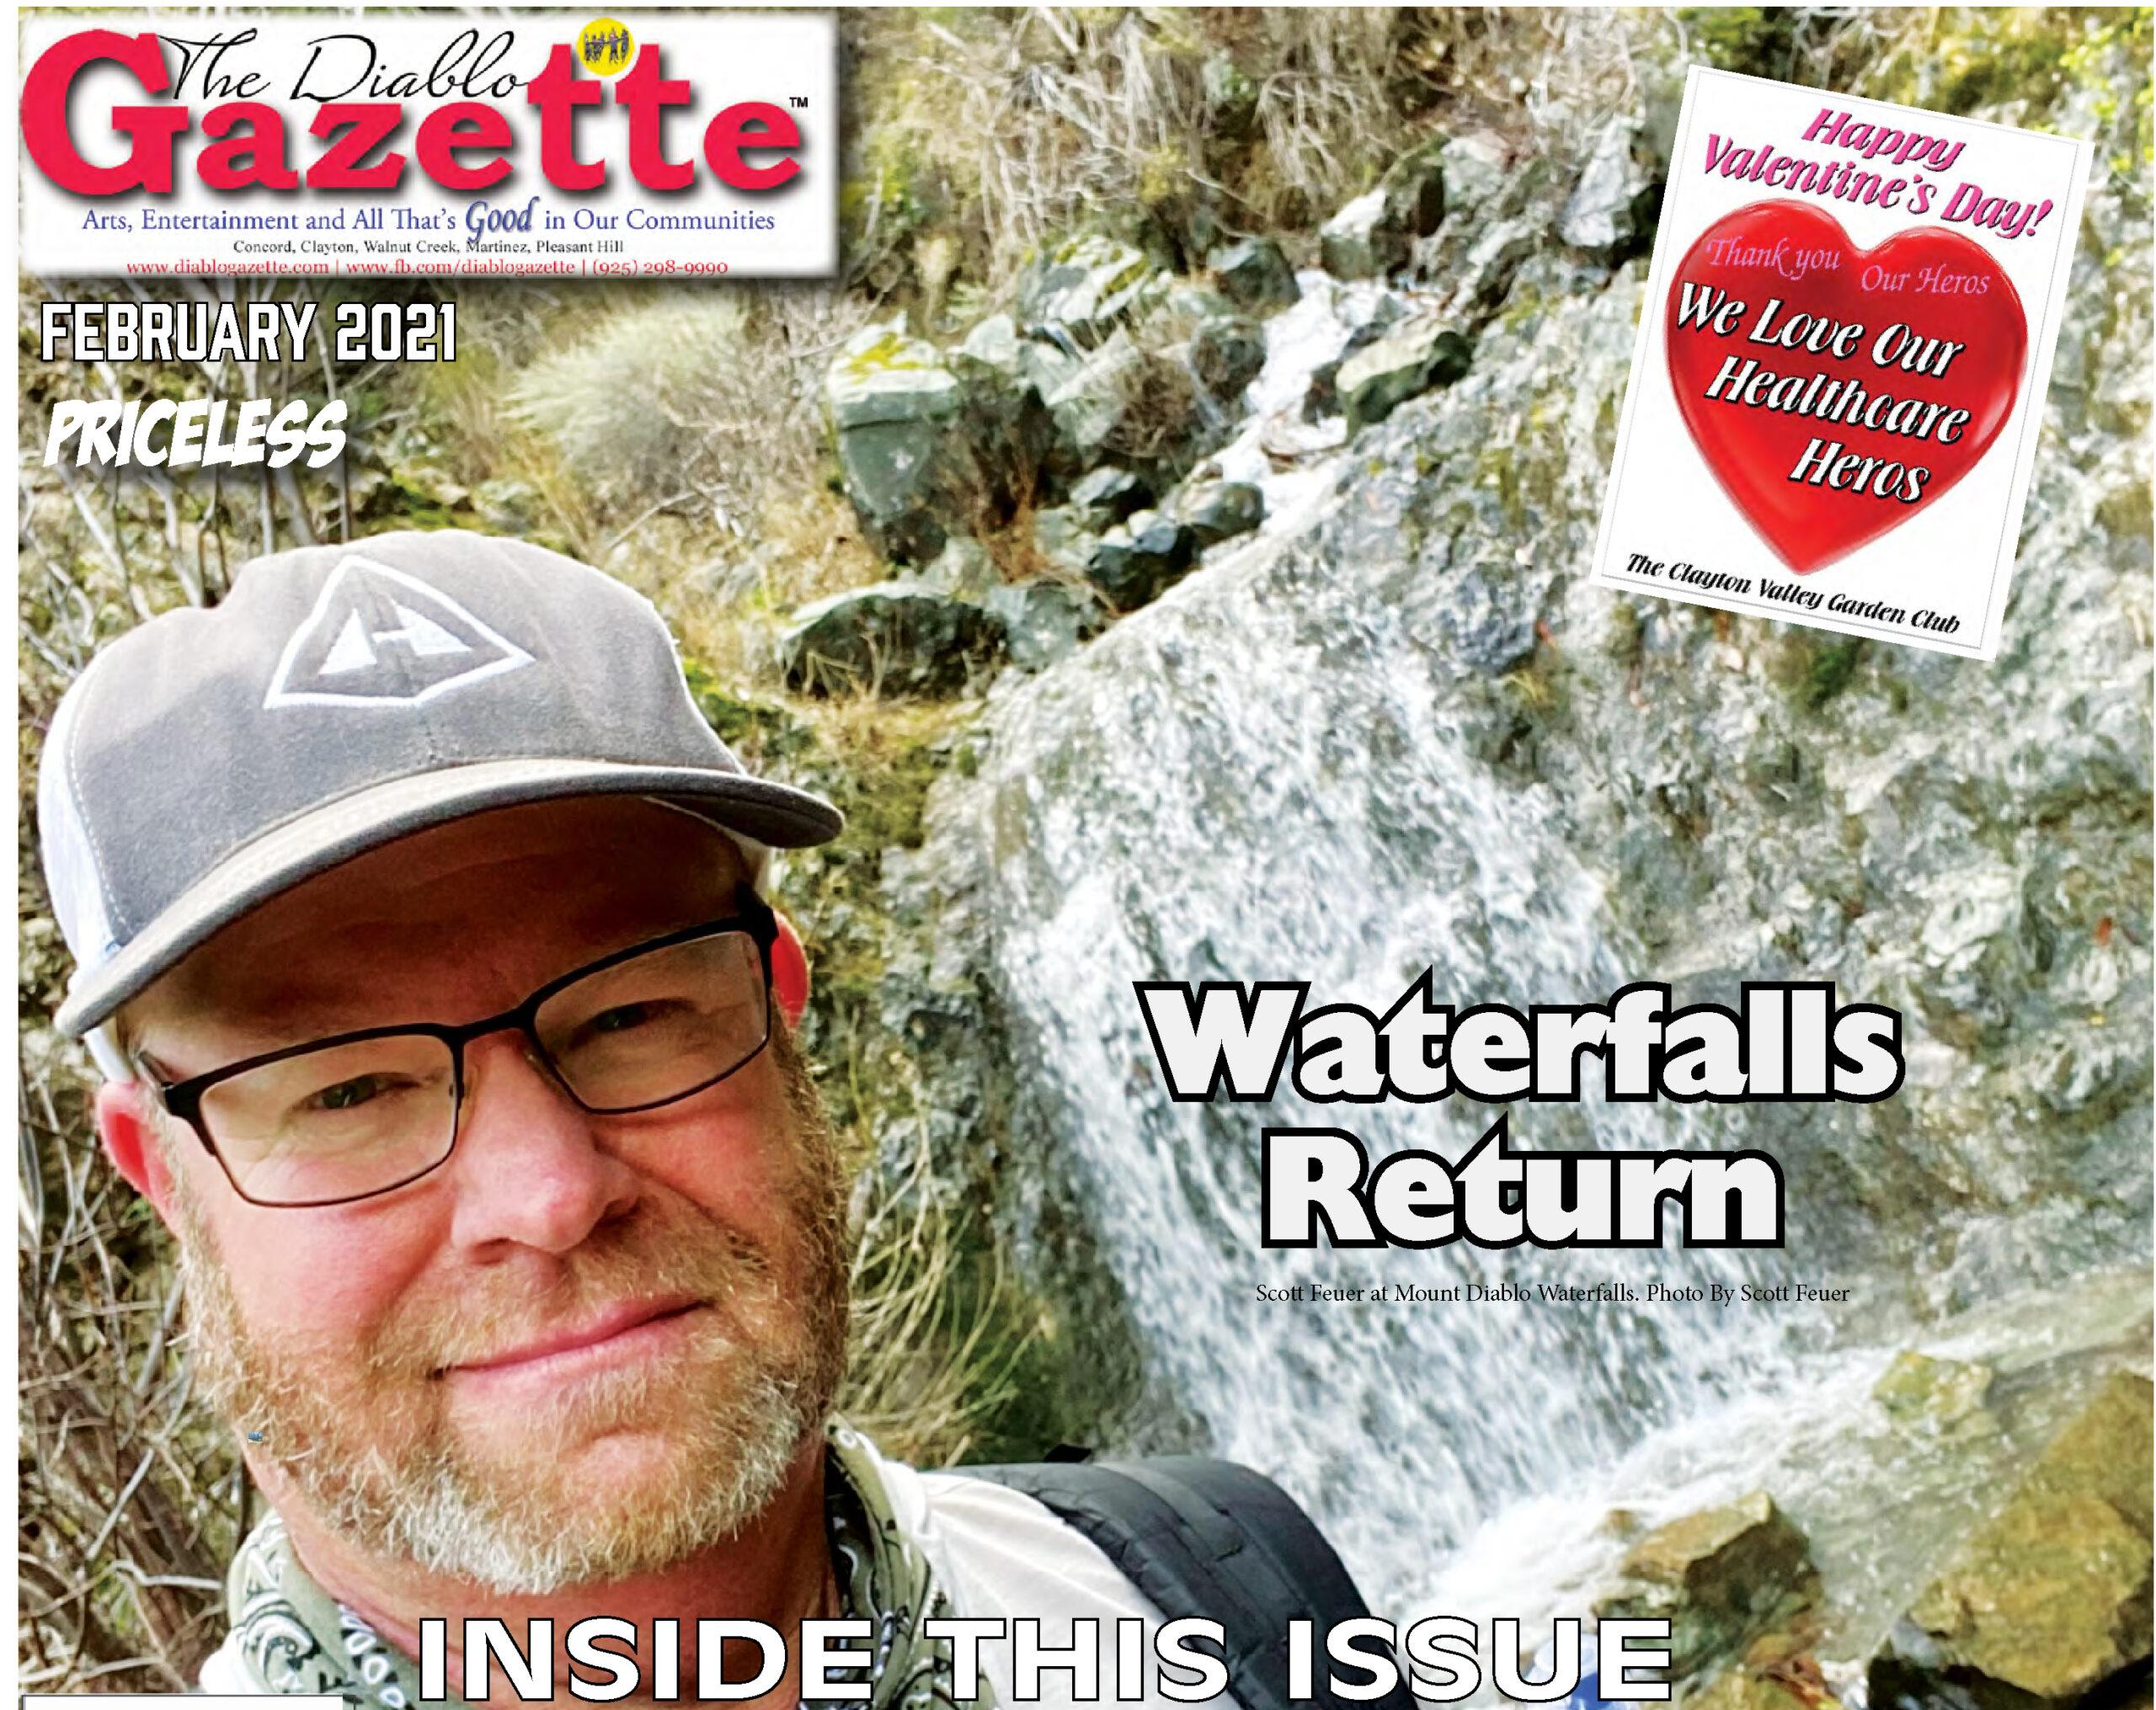 Diablo Gazette February 2021